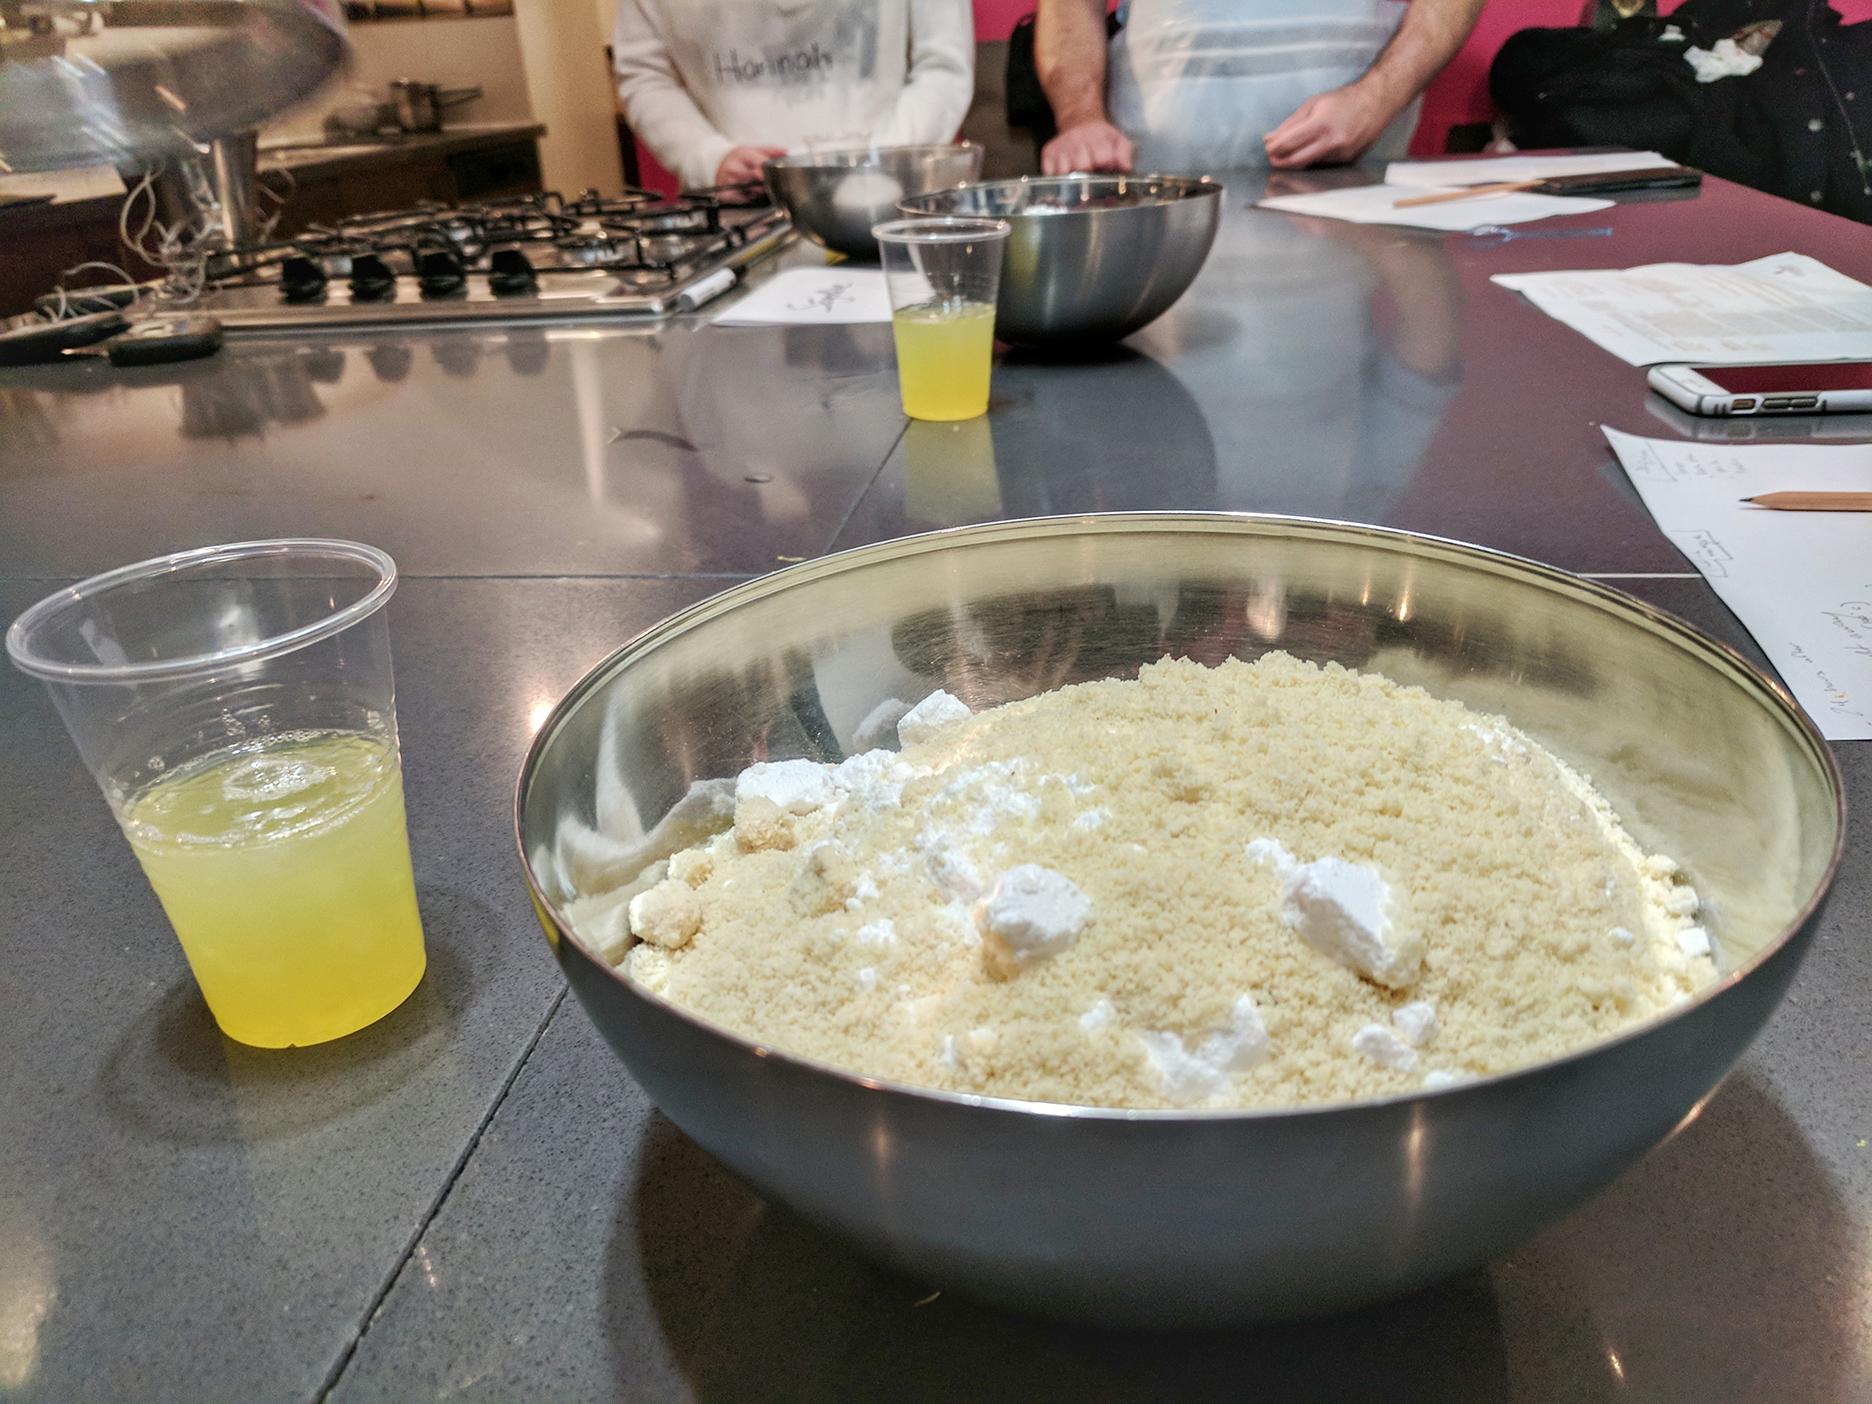 Almond mixture Ingredients